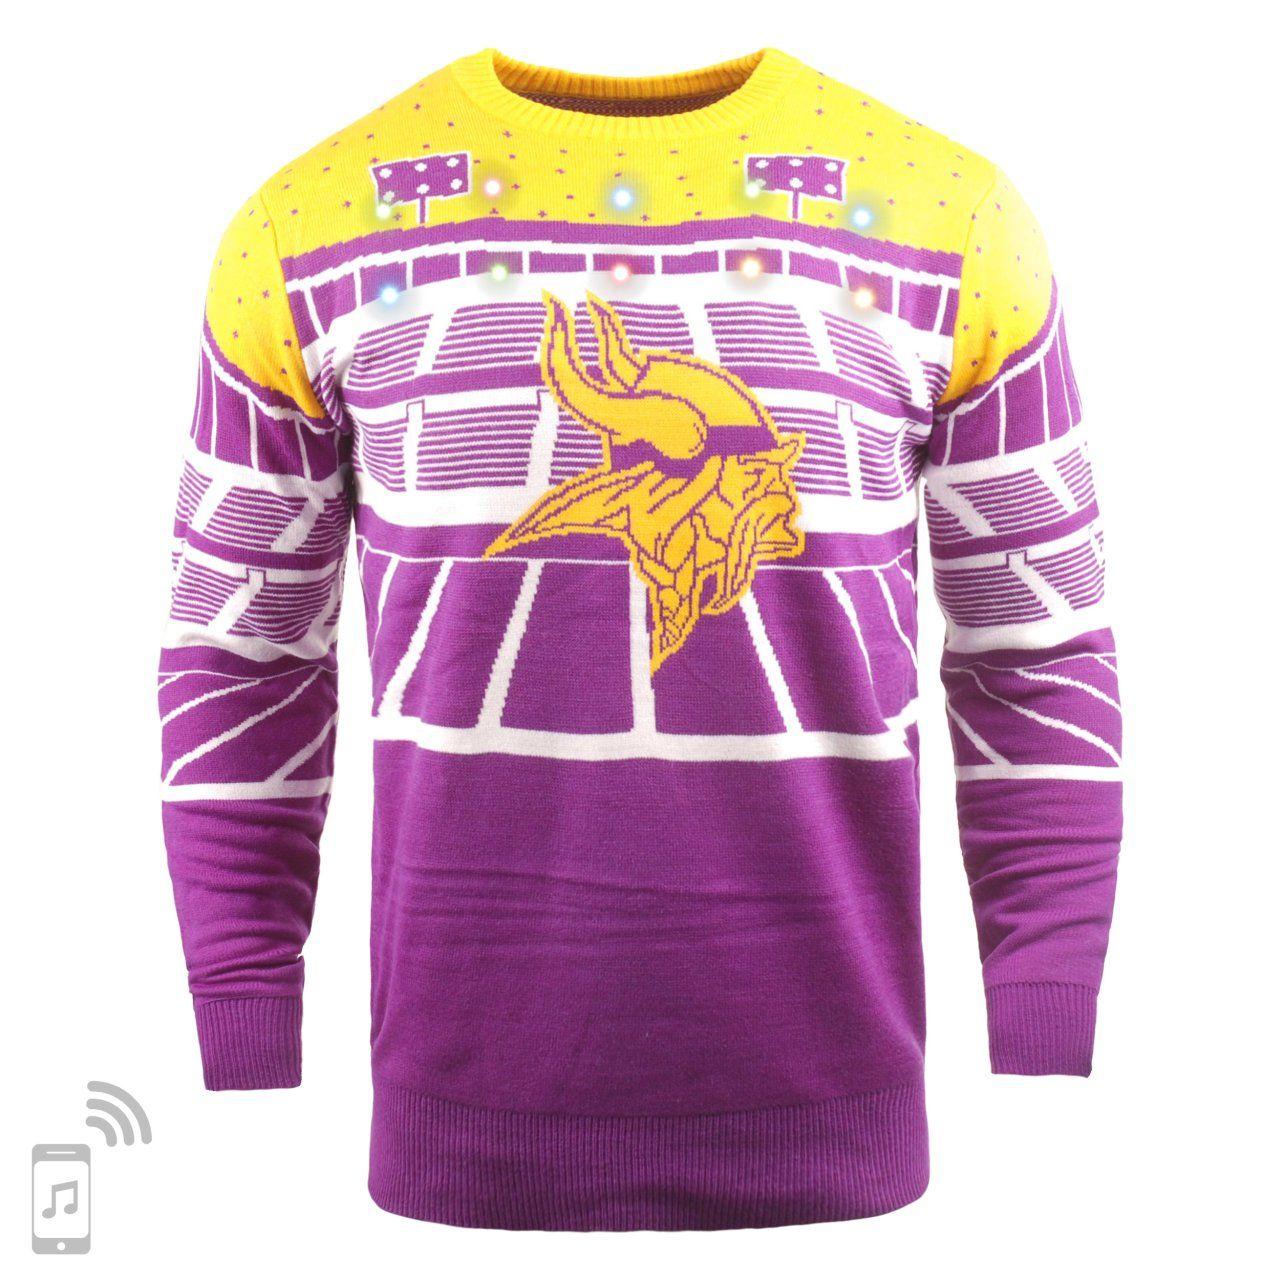 amfoo - NFL Ugly Sweater XMAS LED Pullover - Minnesota Vikings